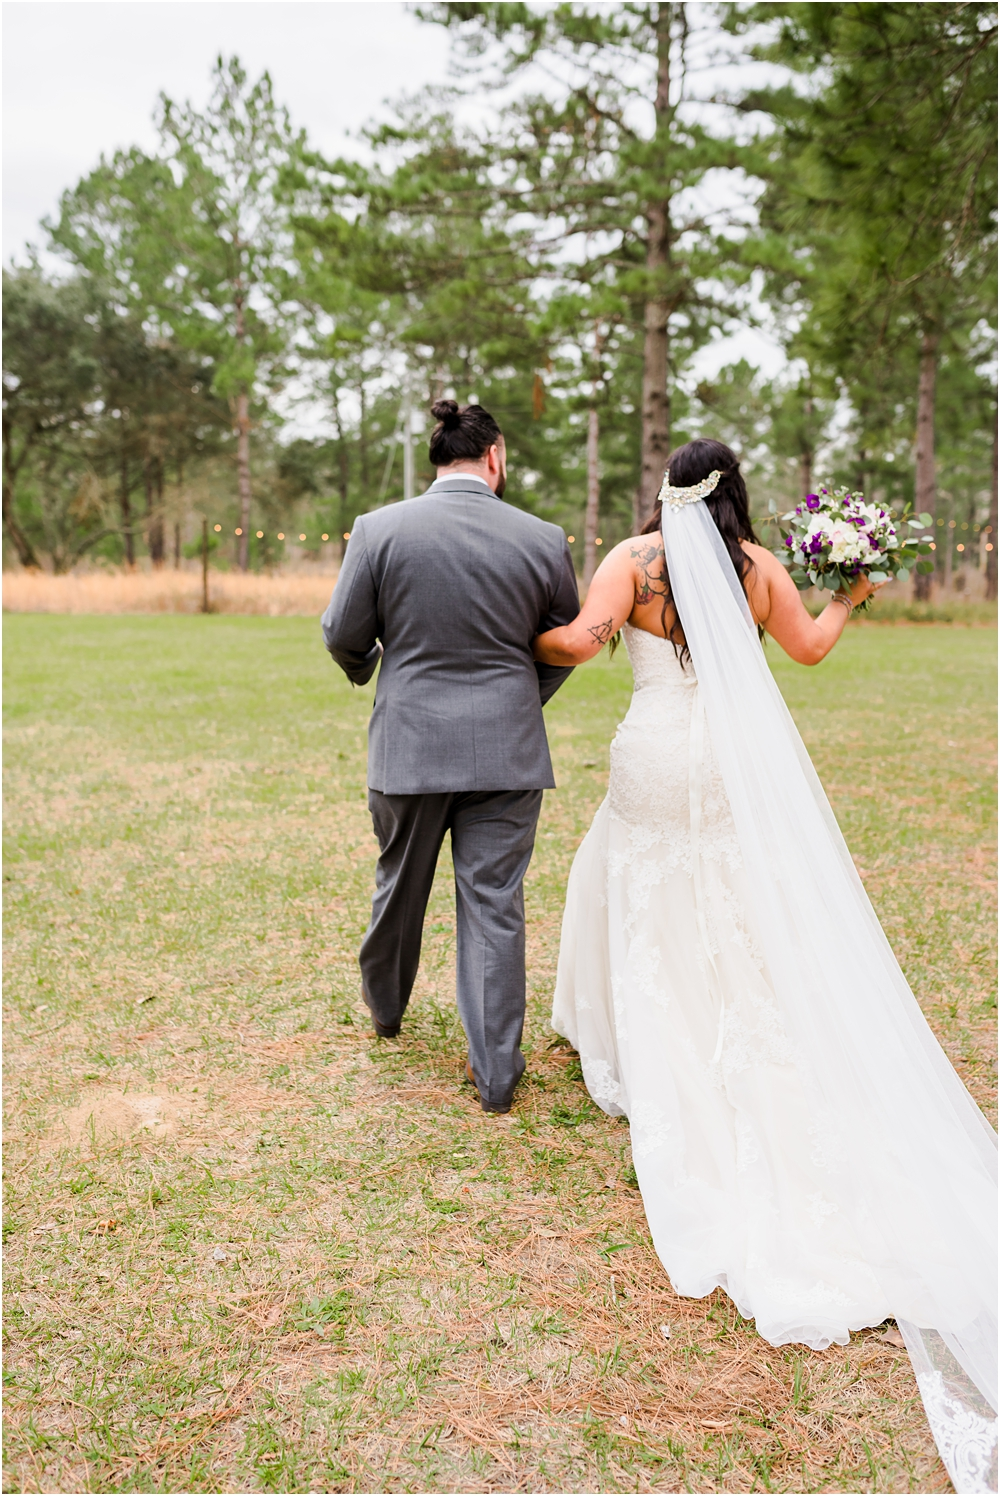 loblolly-rise-tallahassee-wedding-kiersten-stevenson-photography-72.jpg